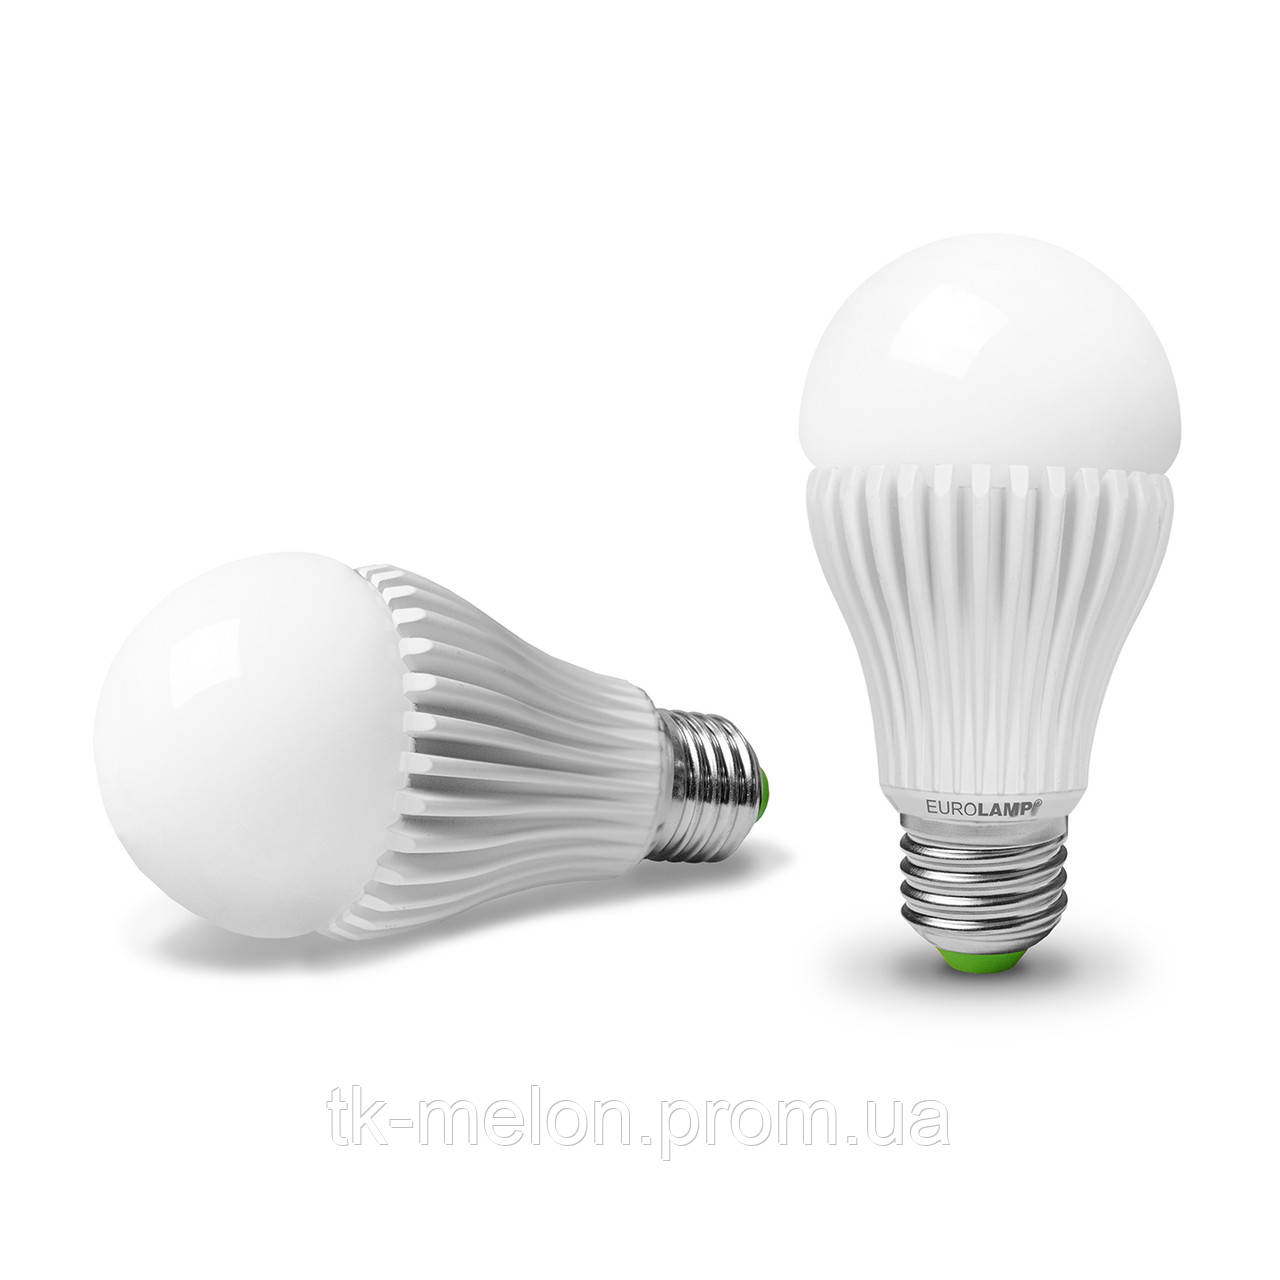 LED Лампа ЕКО A65 13W E27 3000K